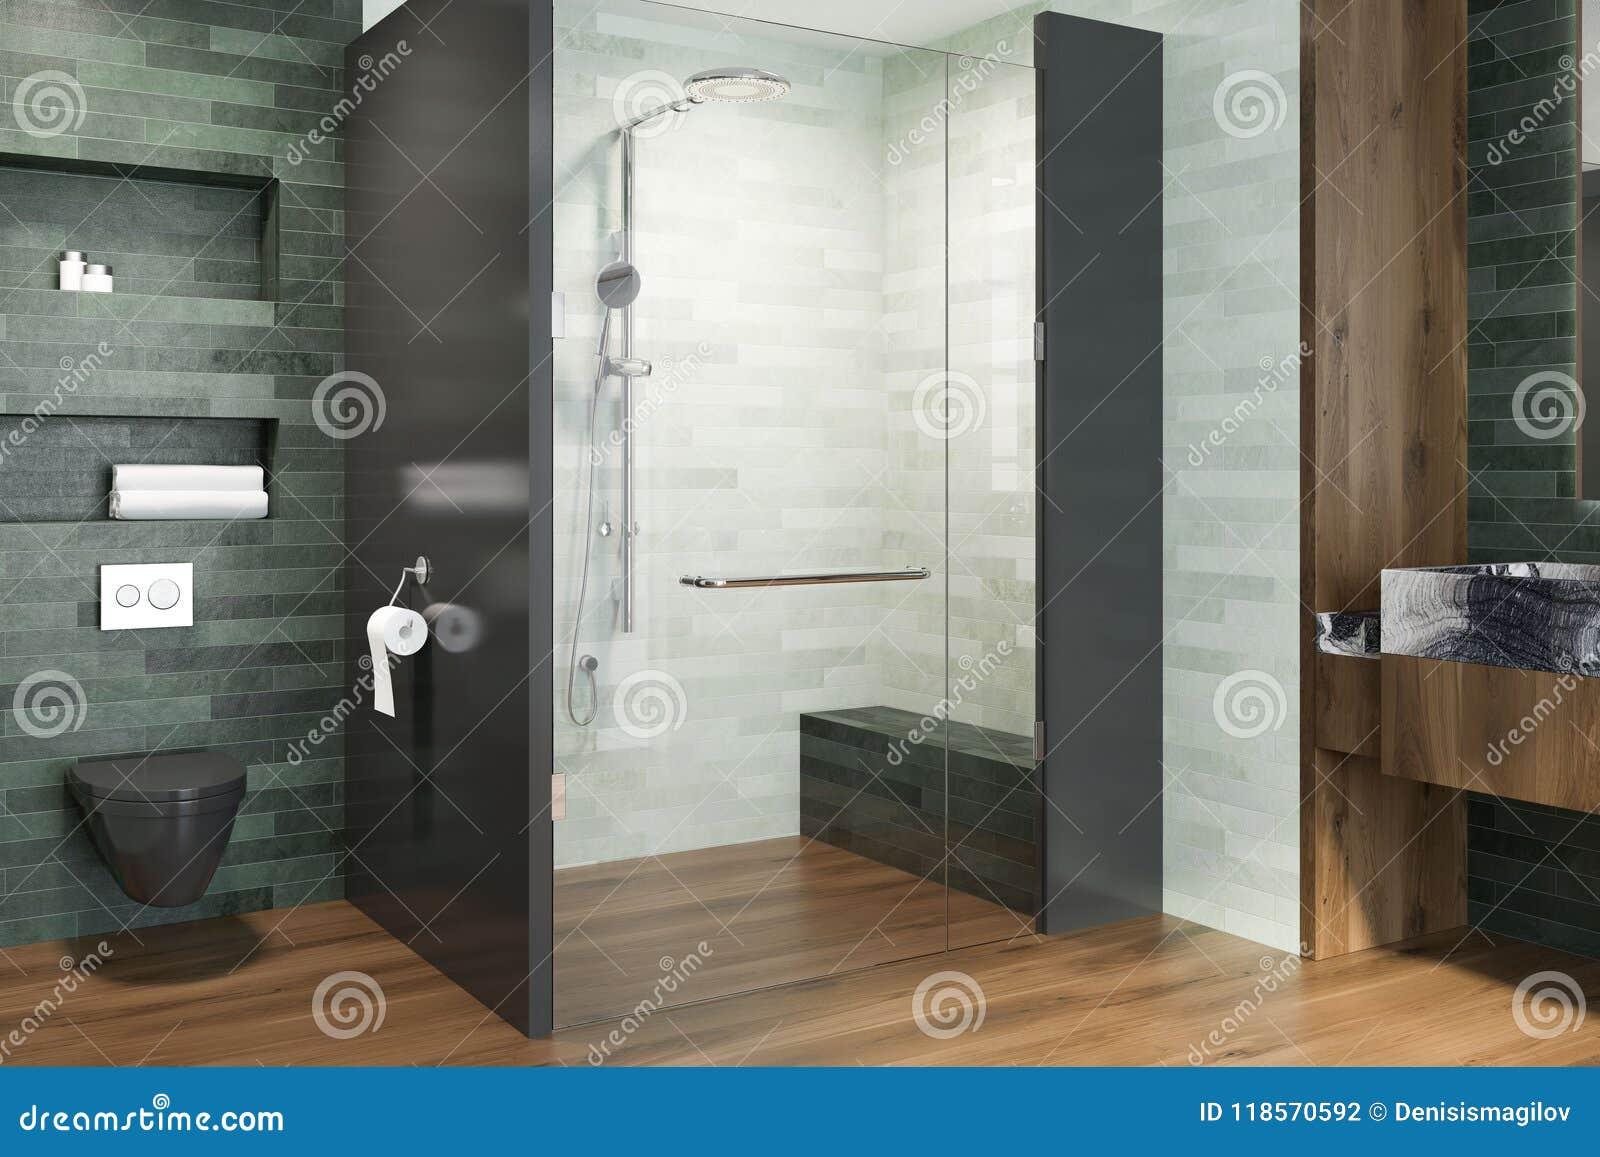 White And Emerald Luxury Bathroom Shower Toilet Stock Illustration ...